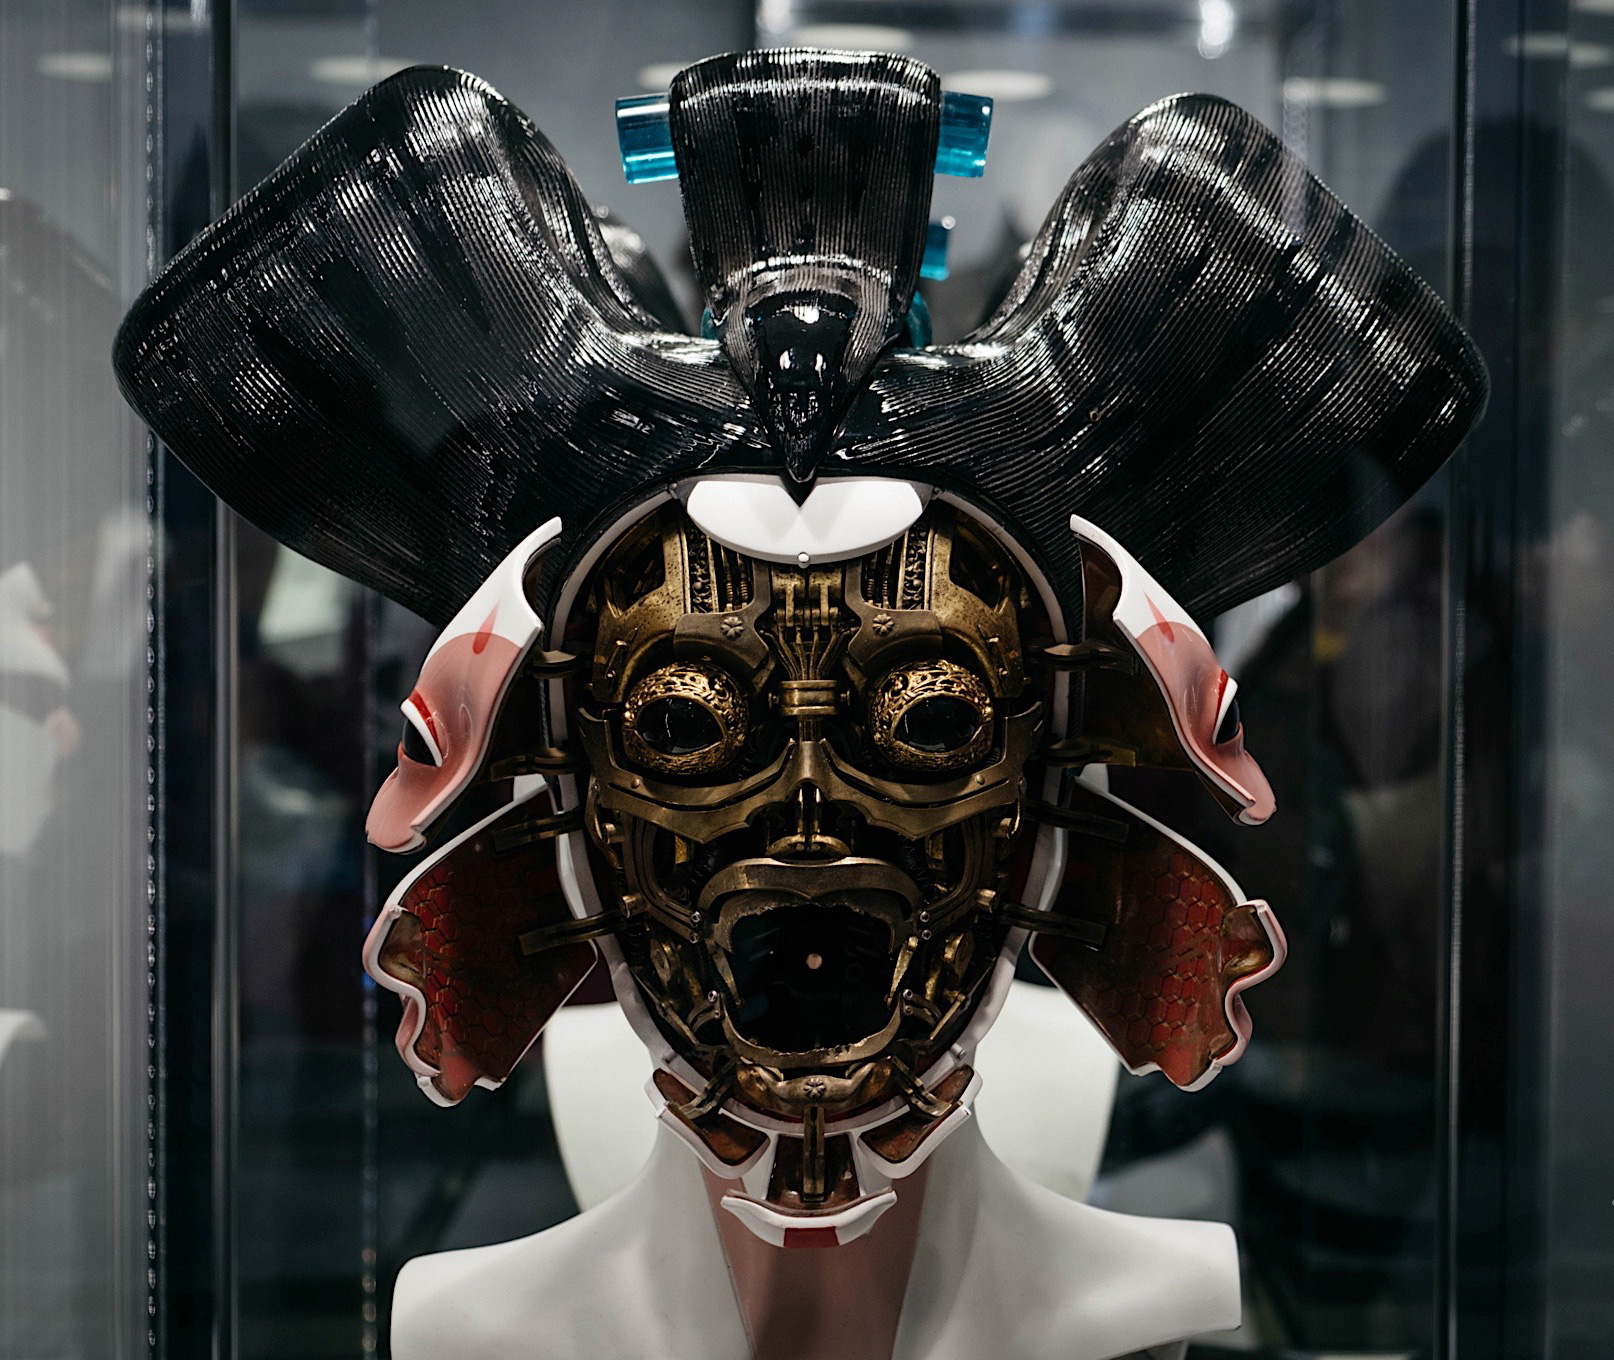 Ghost in the Shell movie 2017 echter Geisha Deluxe anzug faschingskostüme kaufen motorized open close face